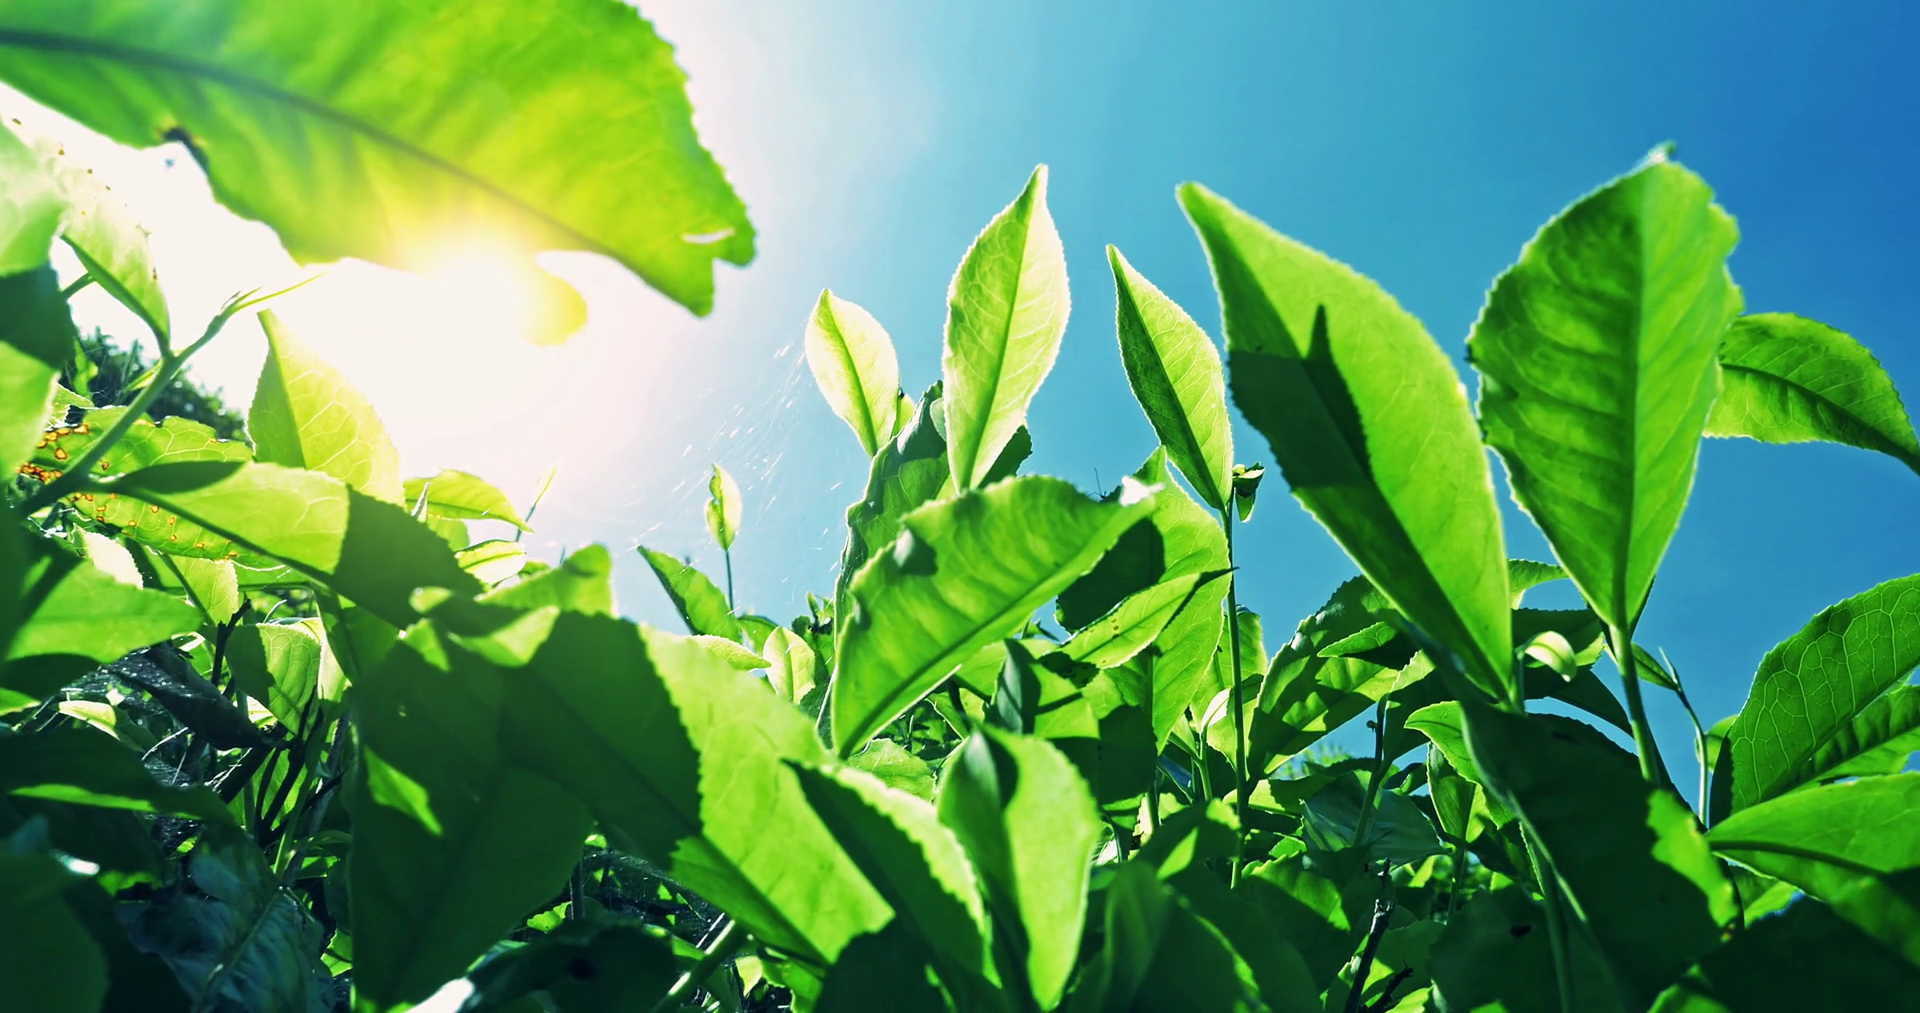 POV video under tea leaves with bright sun light flickering through ...